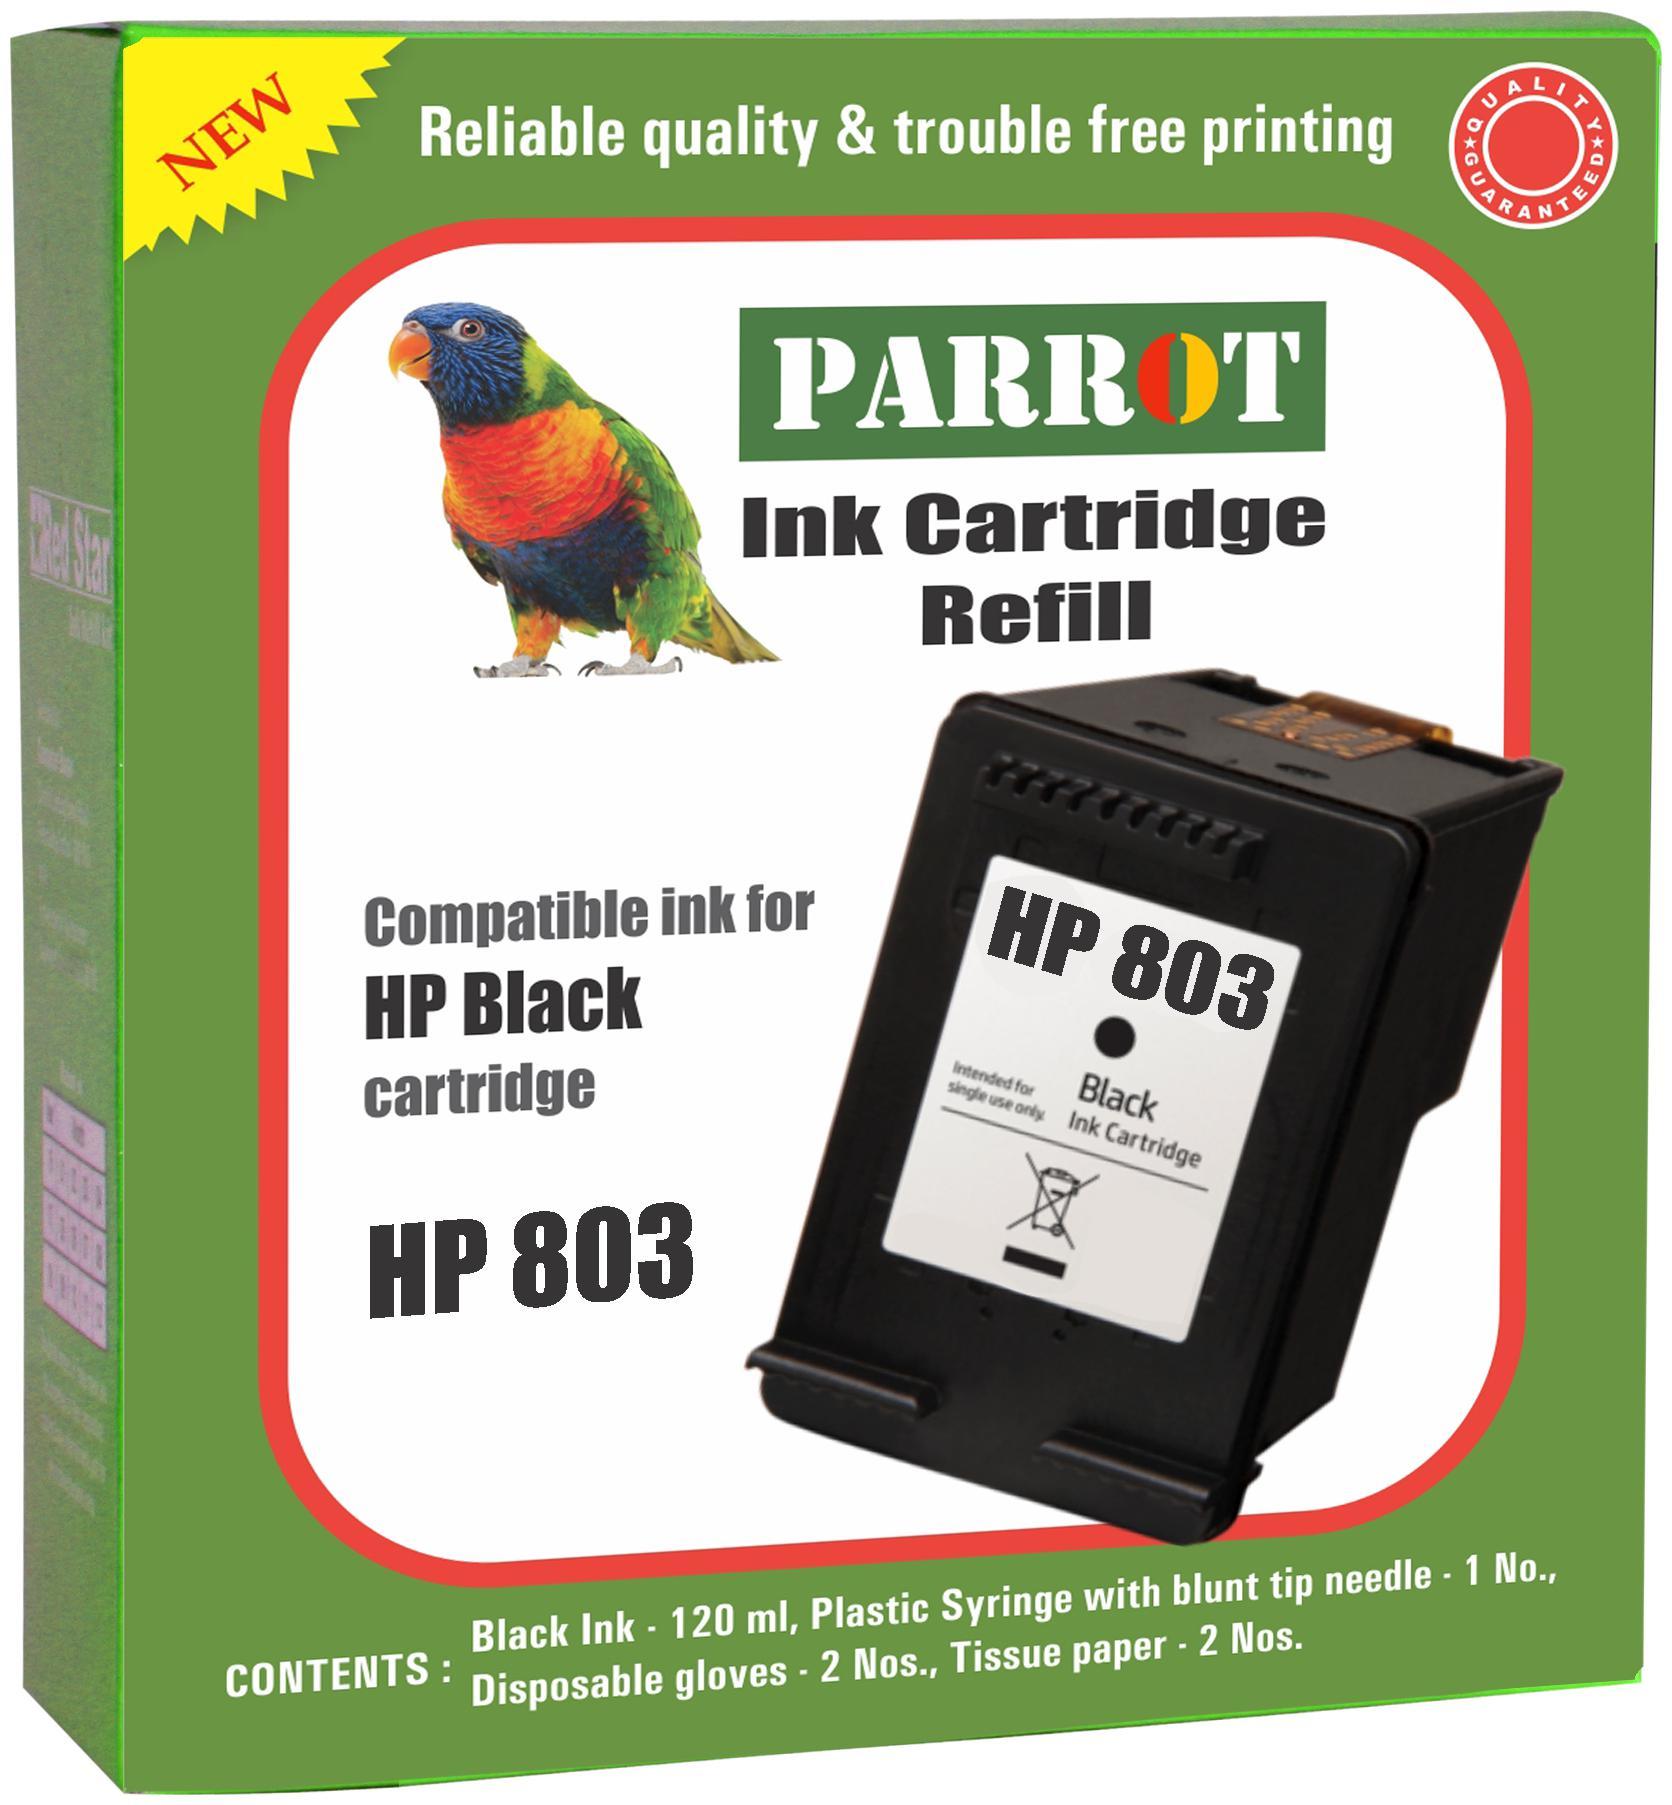 https://assetscdn1.paytm.com/images/catalog/product/C/CO/COMPARROT-INK-CCOMP764983789C79D/1562674341857_0..jpg